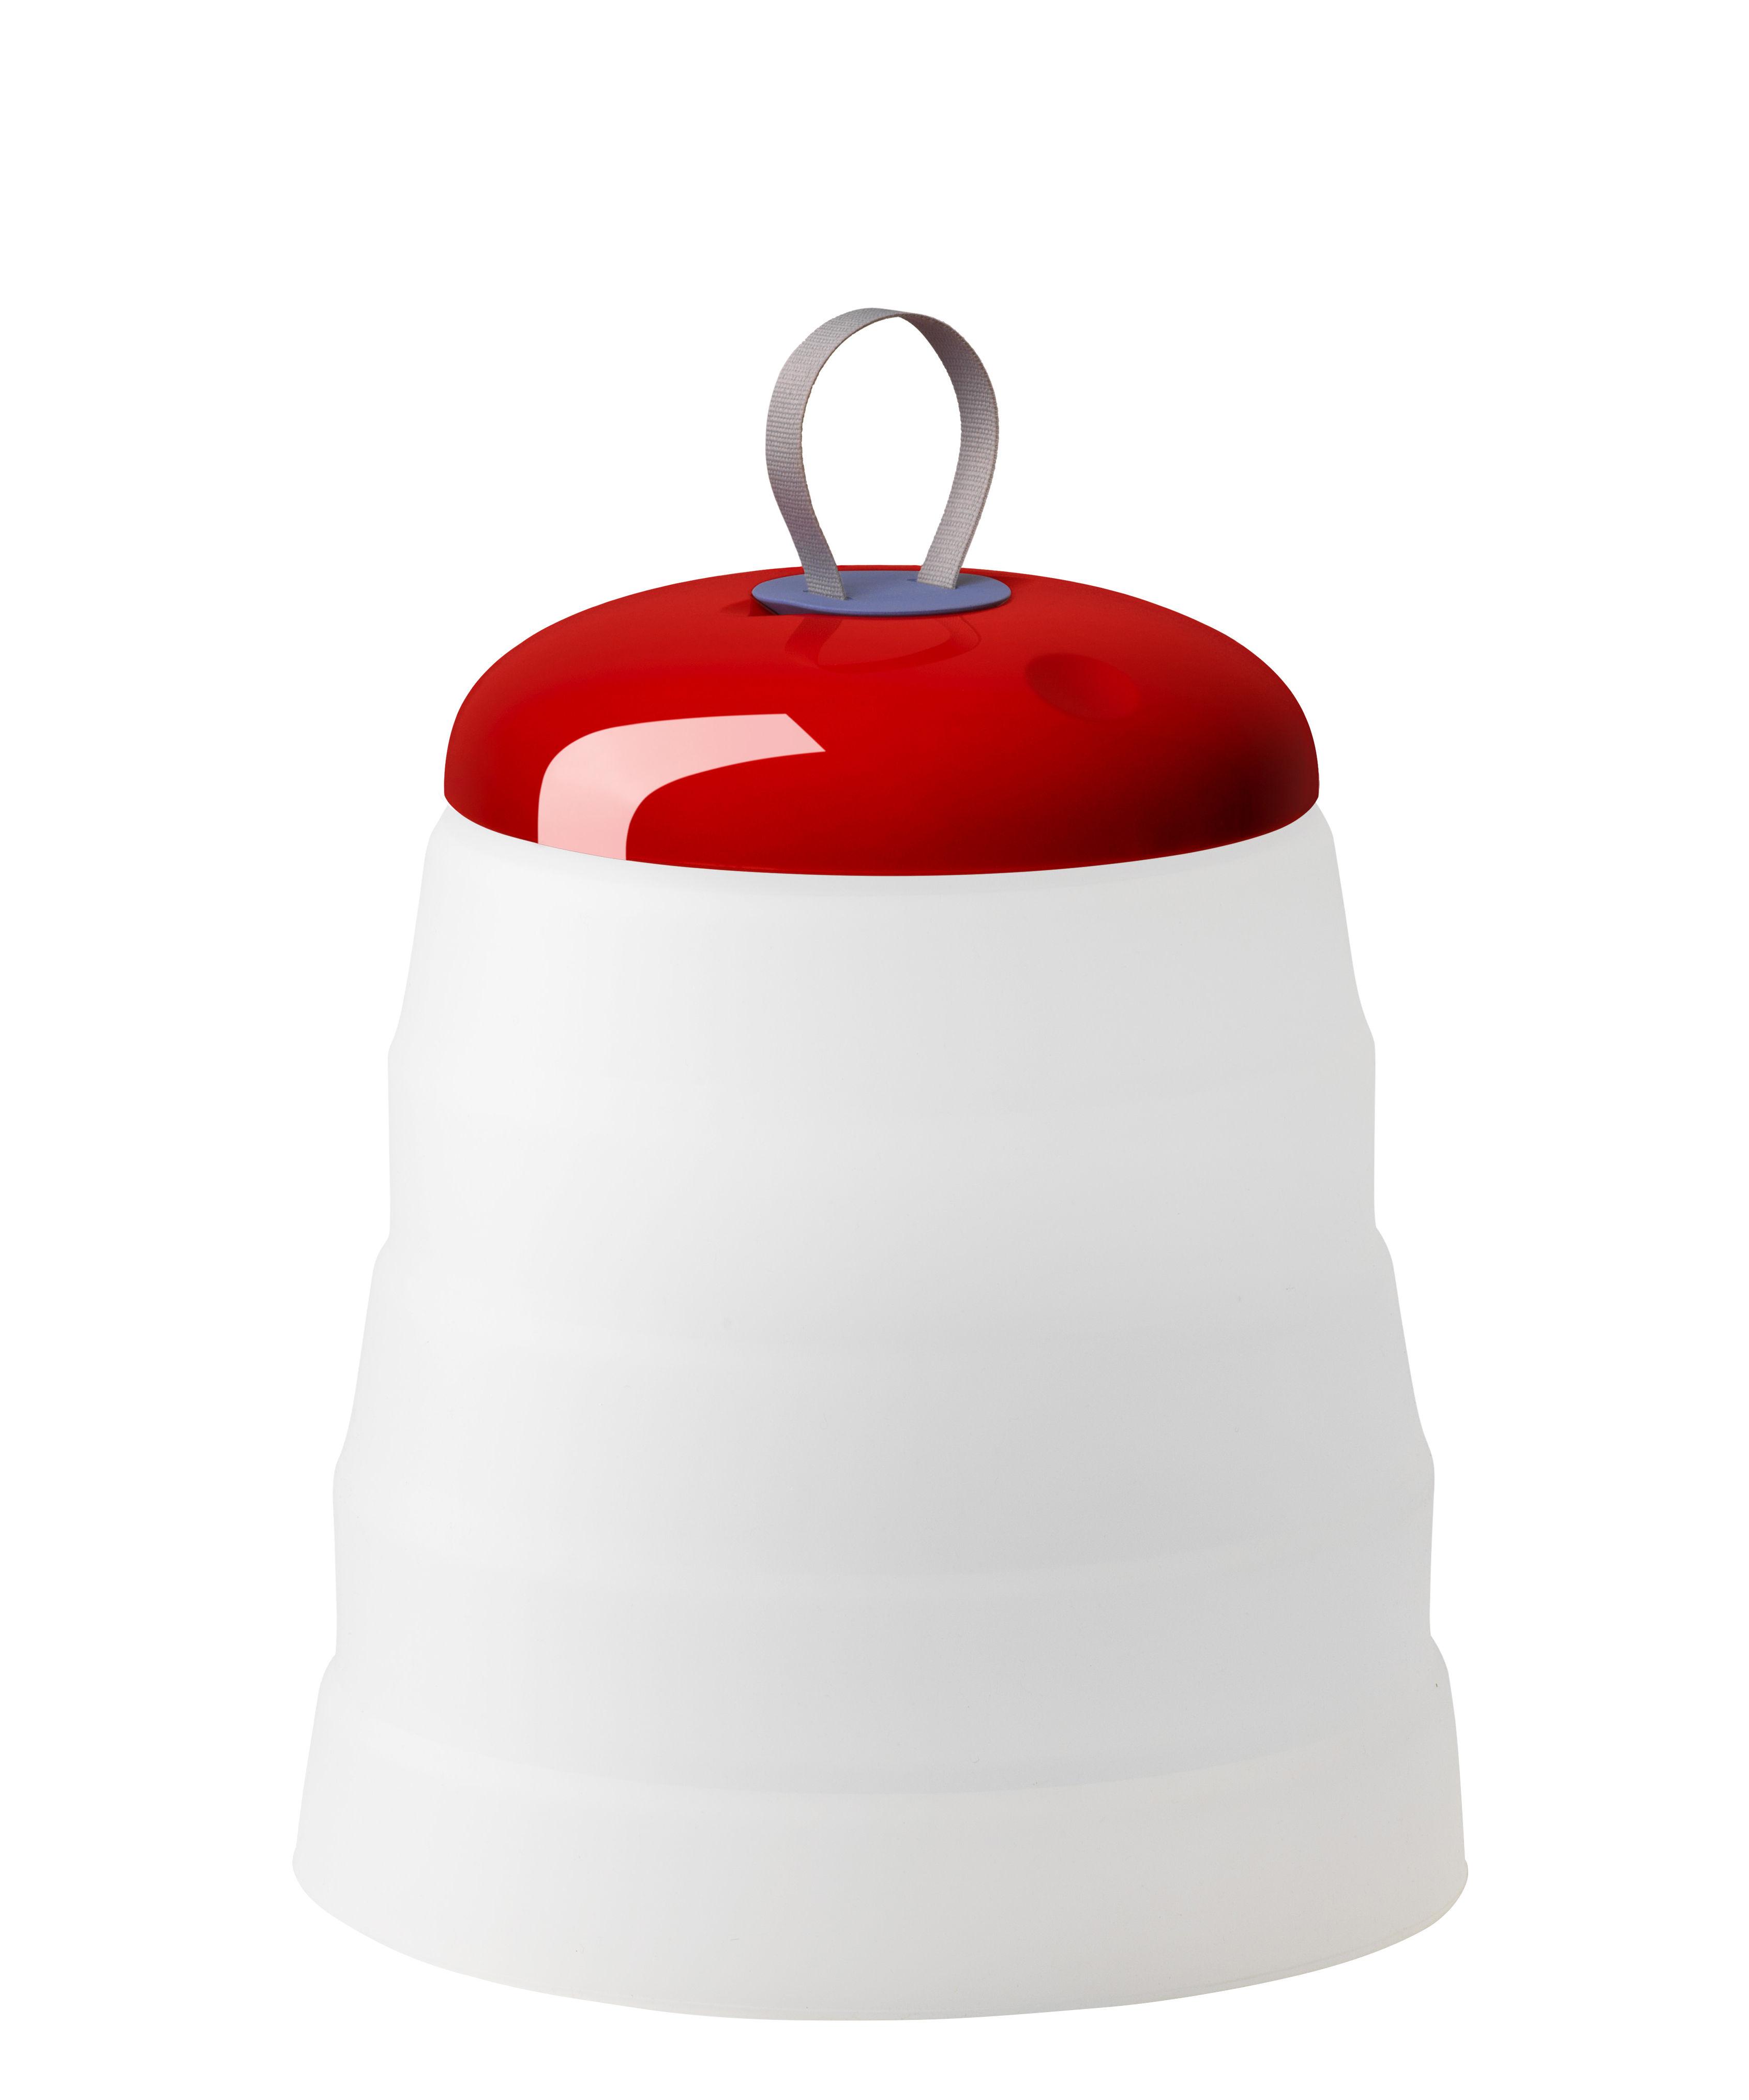 Leuchten - Tischleuchten - Cri Cri LED Outdoor Lampe ohne Kabel / H 31 cm - mit USB-Ladekabel - Foscarini - Rot - ABS, PMMA, Silikon